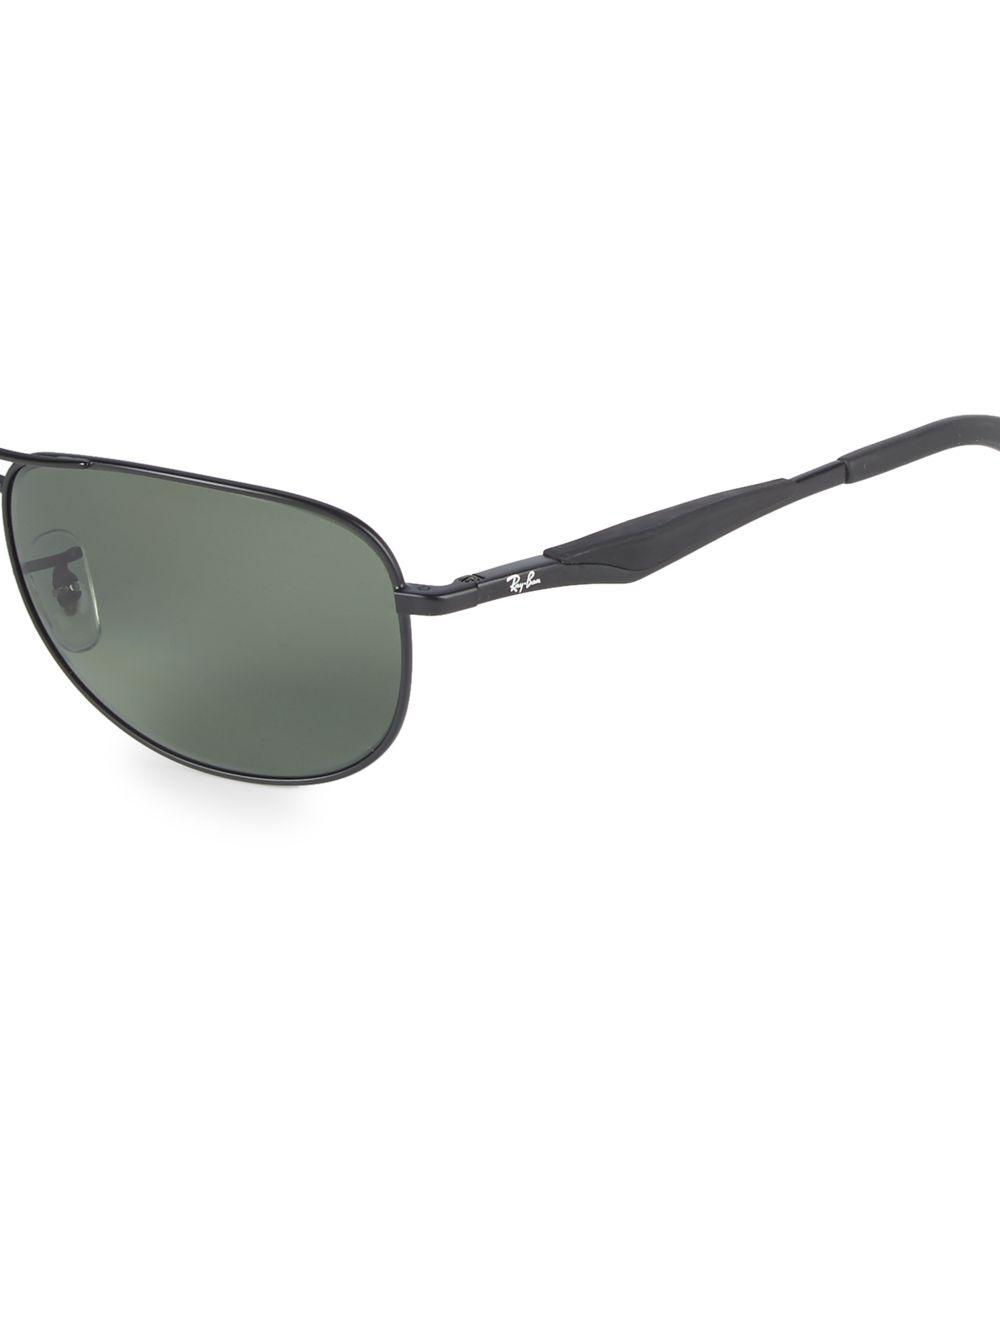 18fa4208dcd Ray-Ban - Black 59mm Polarized Pilot Sunglasses - Lyst. View fullscreen